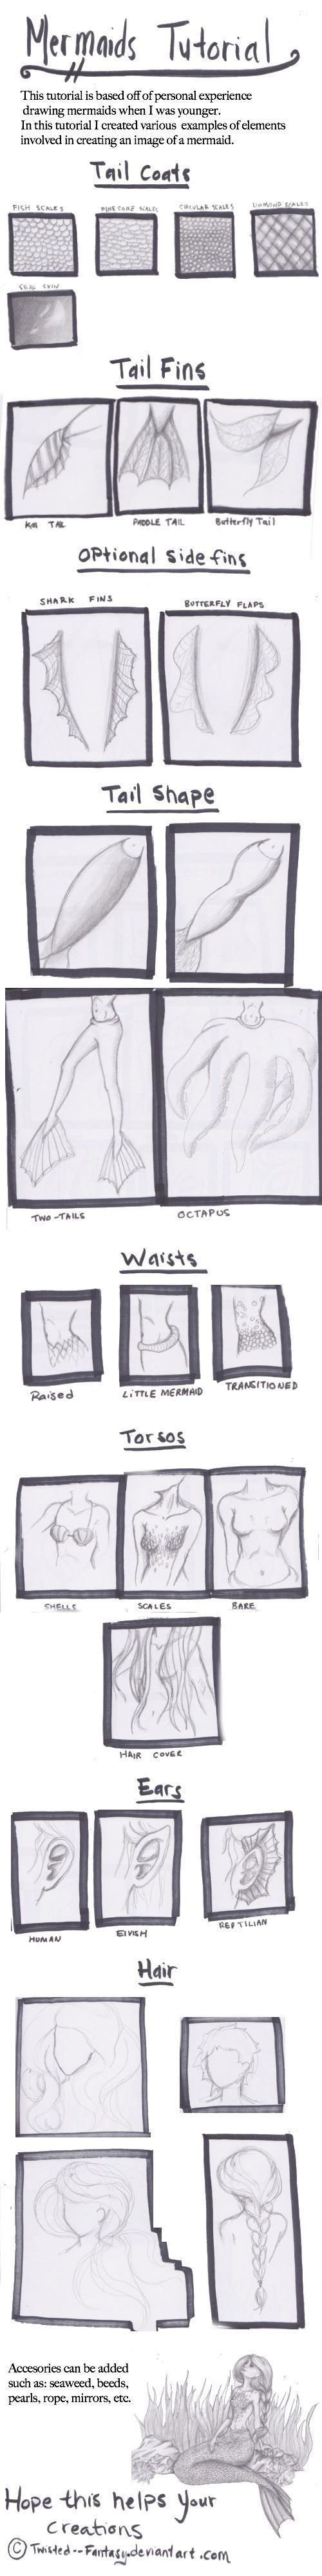 Mermaid Tutorial by Twisted--Fantasy on deviantART by marianne